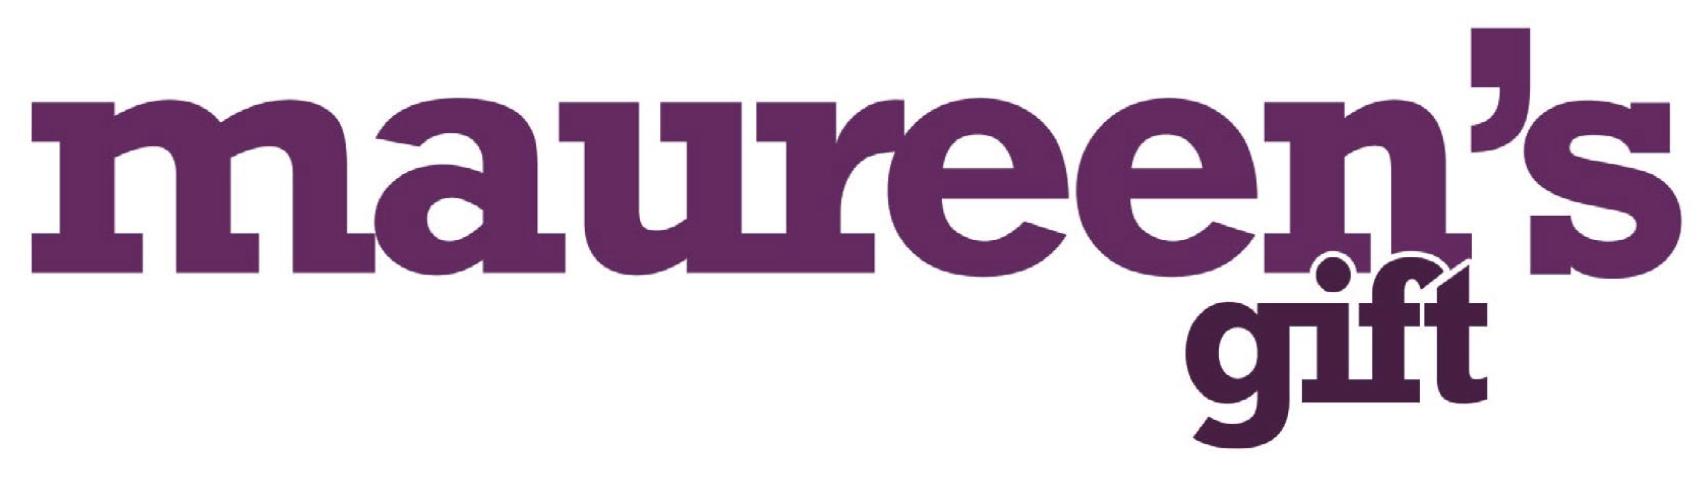 maureens_gift_logo